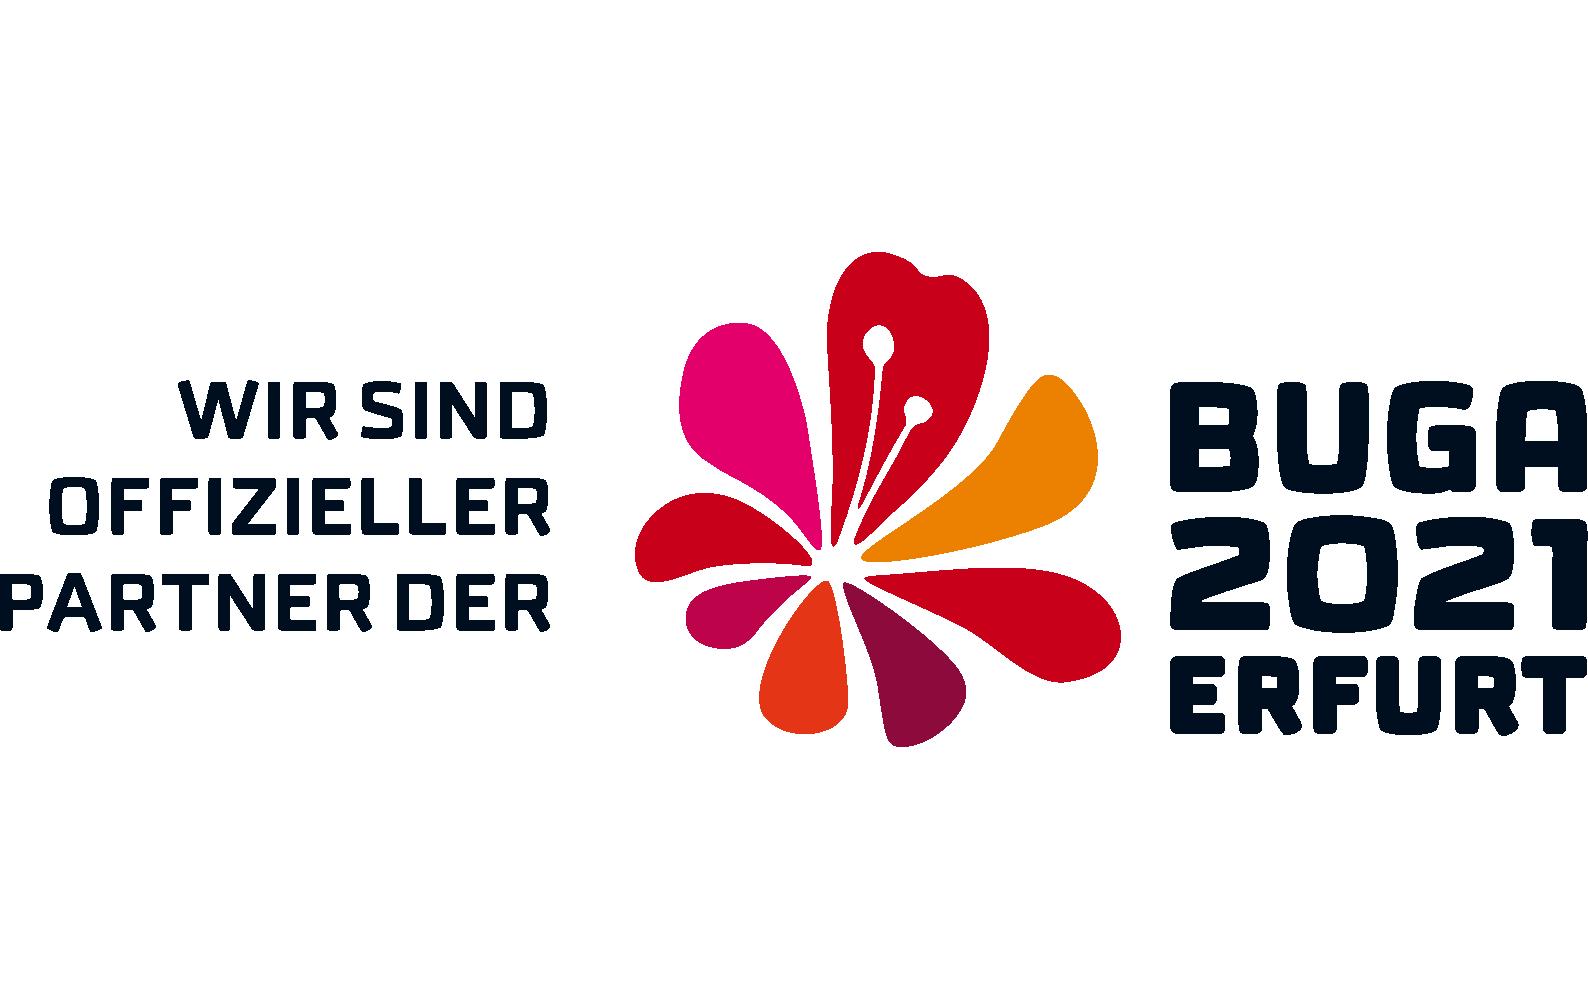 BUGA 2021 Erfurt